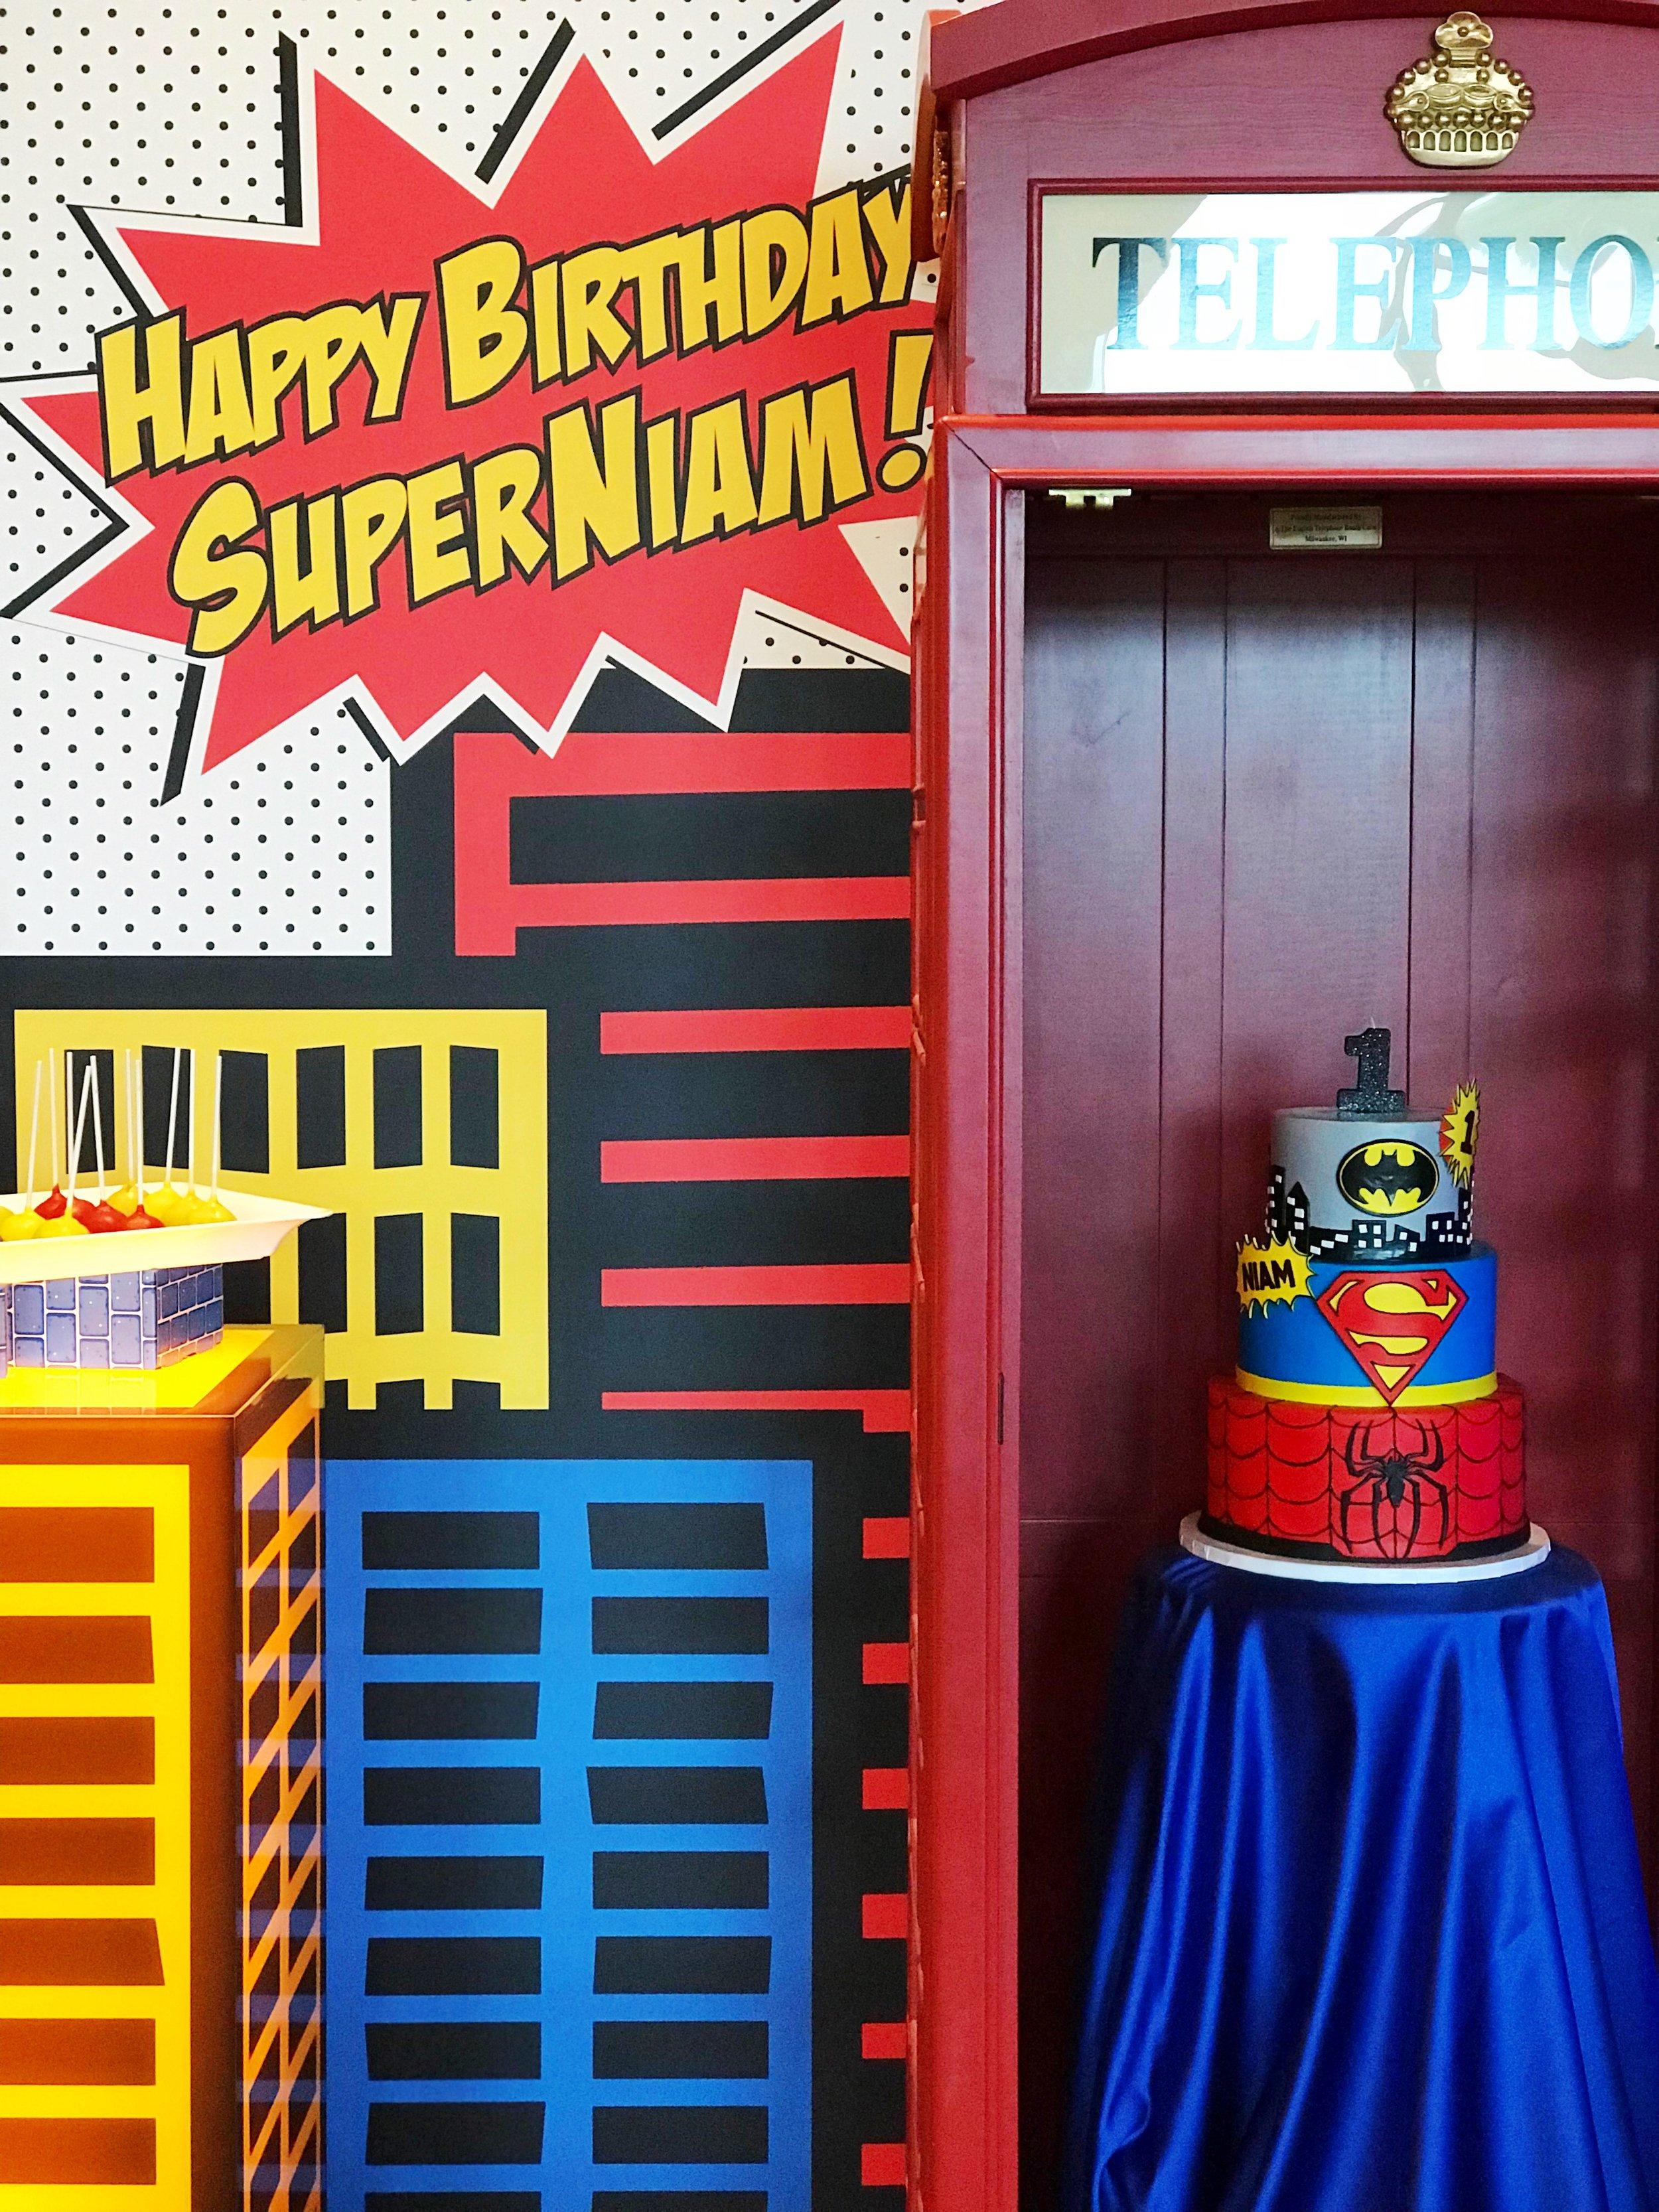 A SUPER 1st Birthday Bash